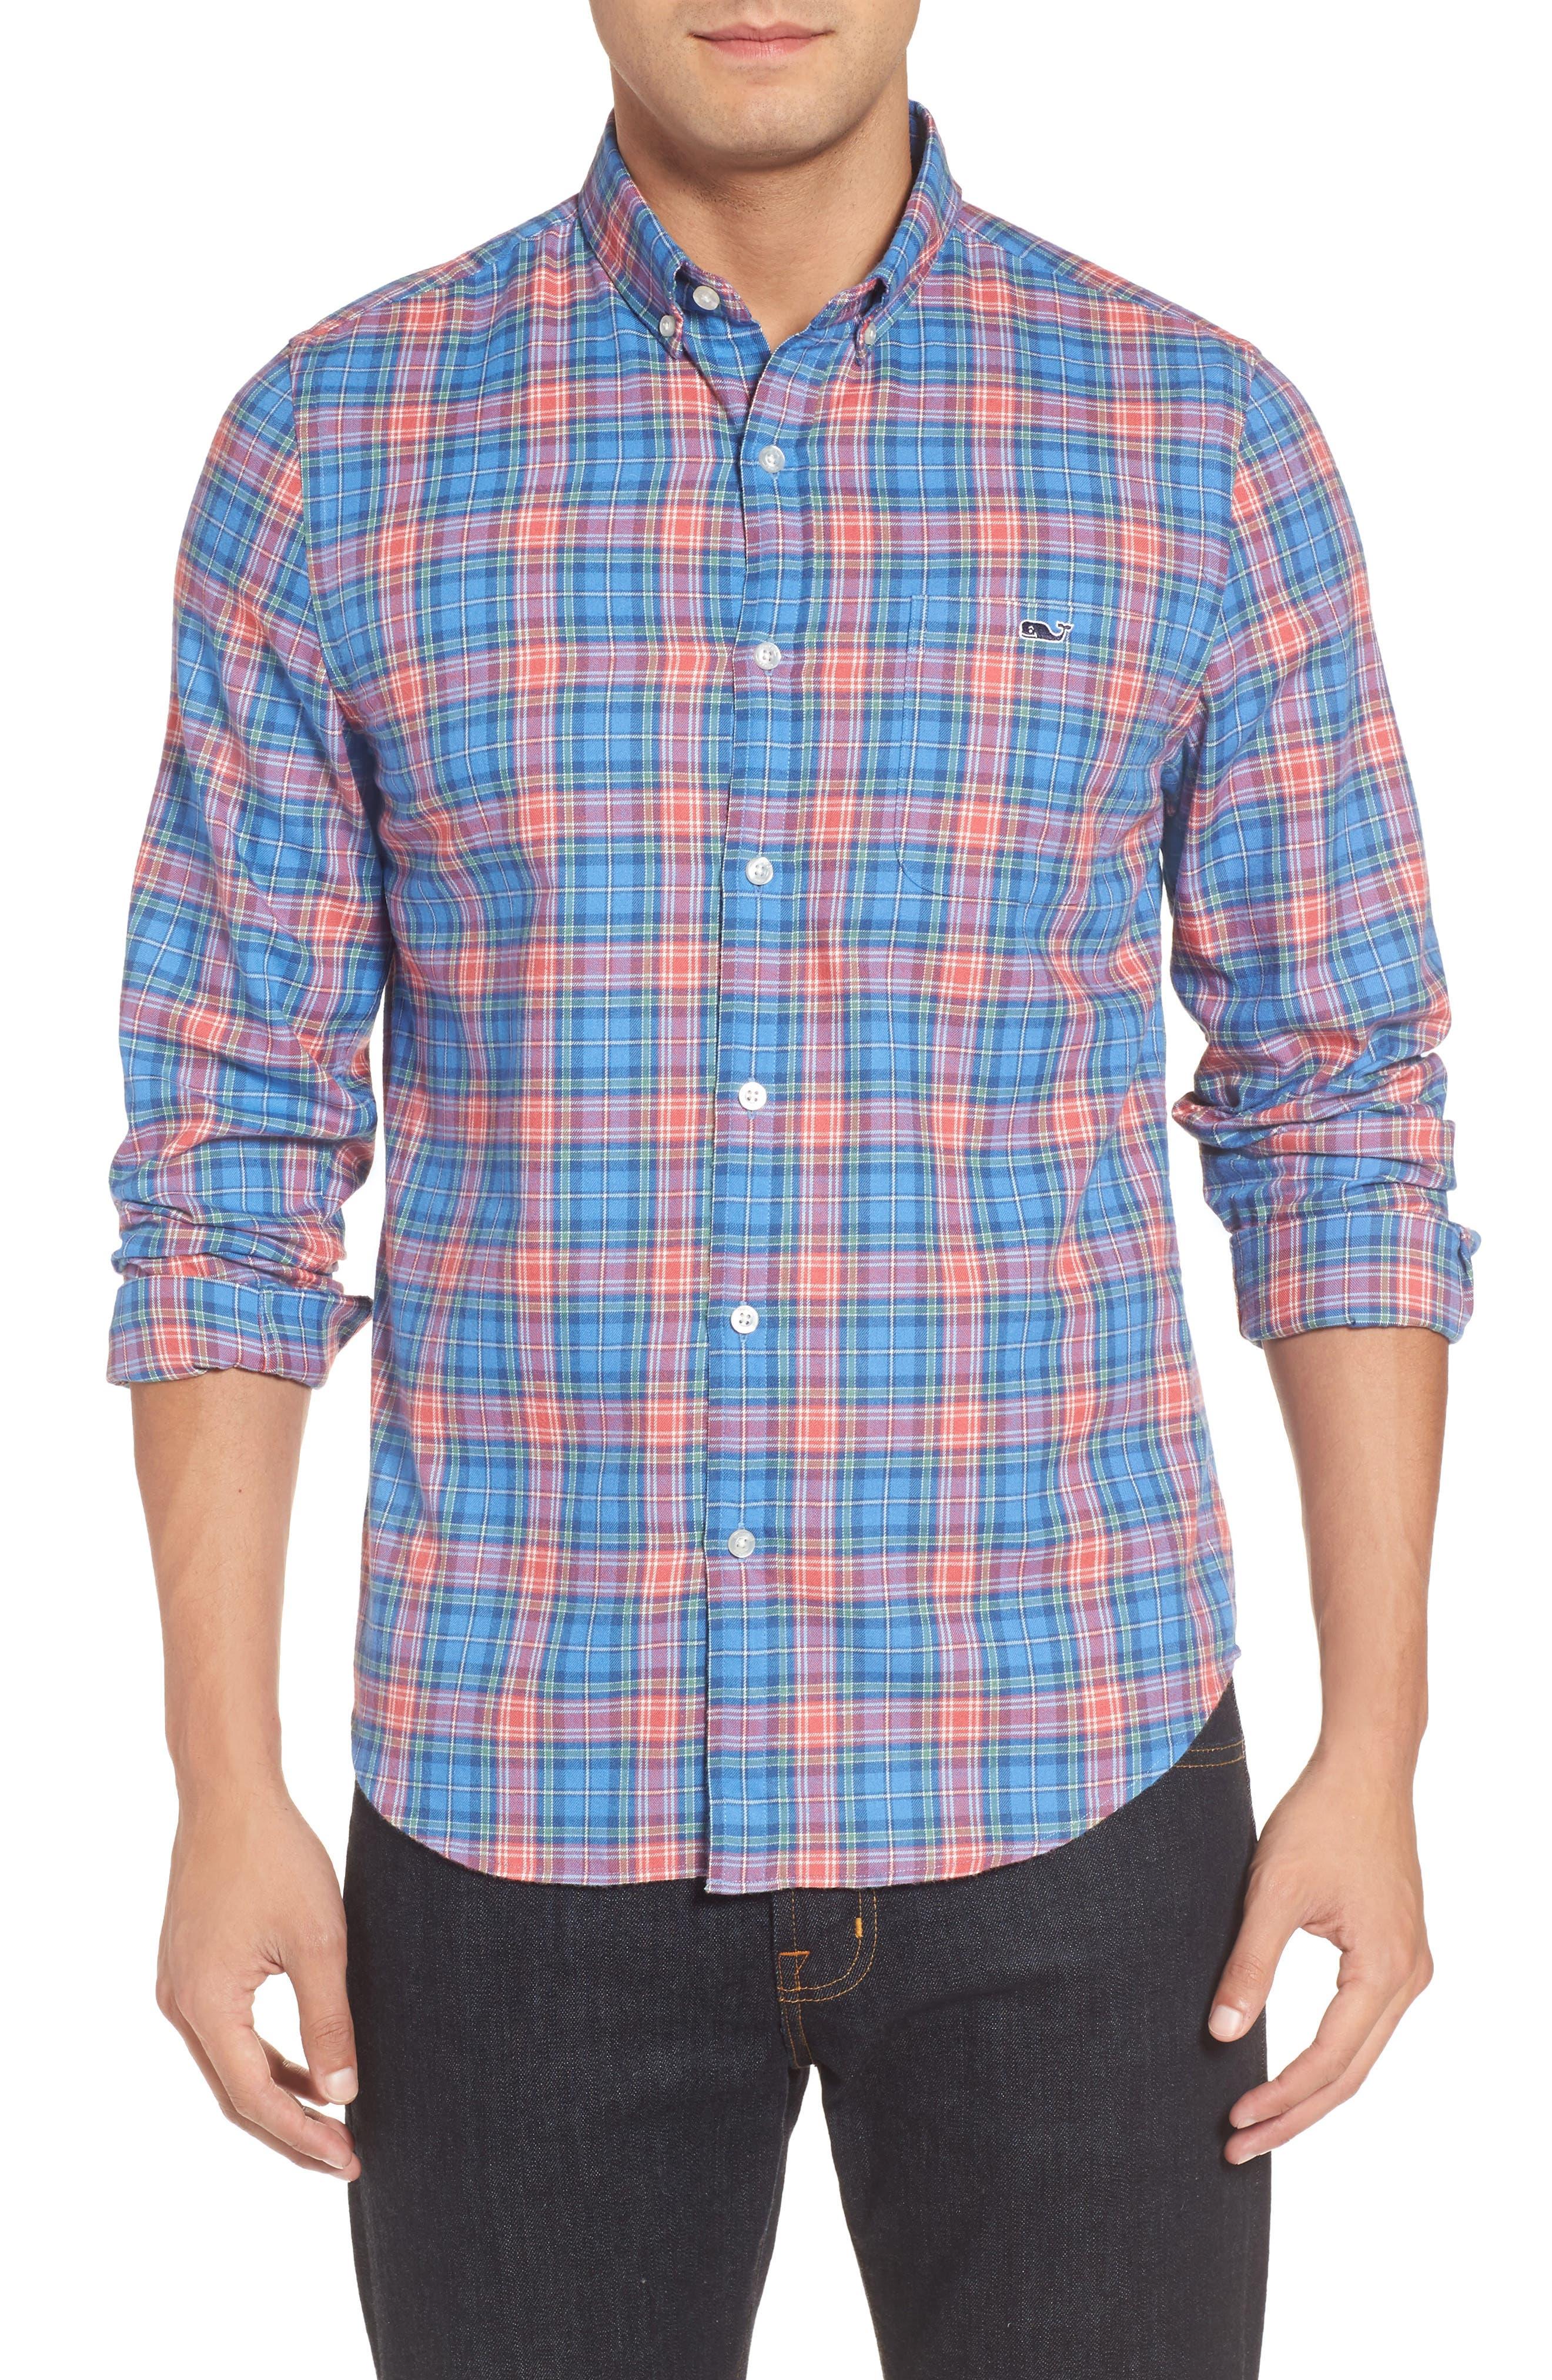 Kingsley Park Slim Fit Plaid Sport Shirt,                         Main,                         color, 431